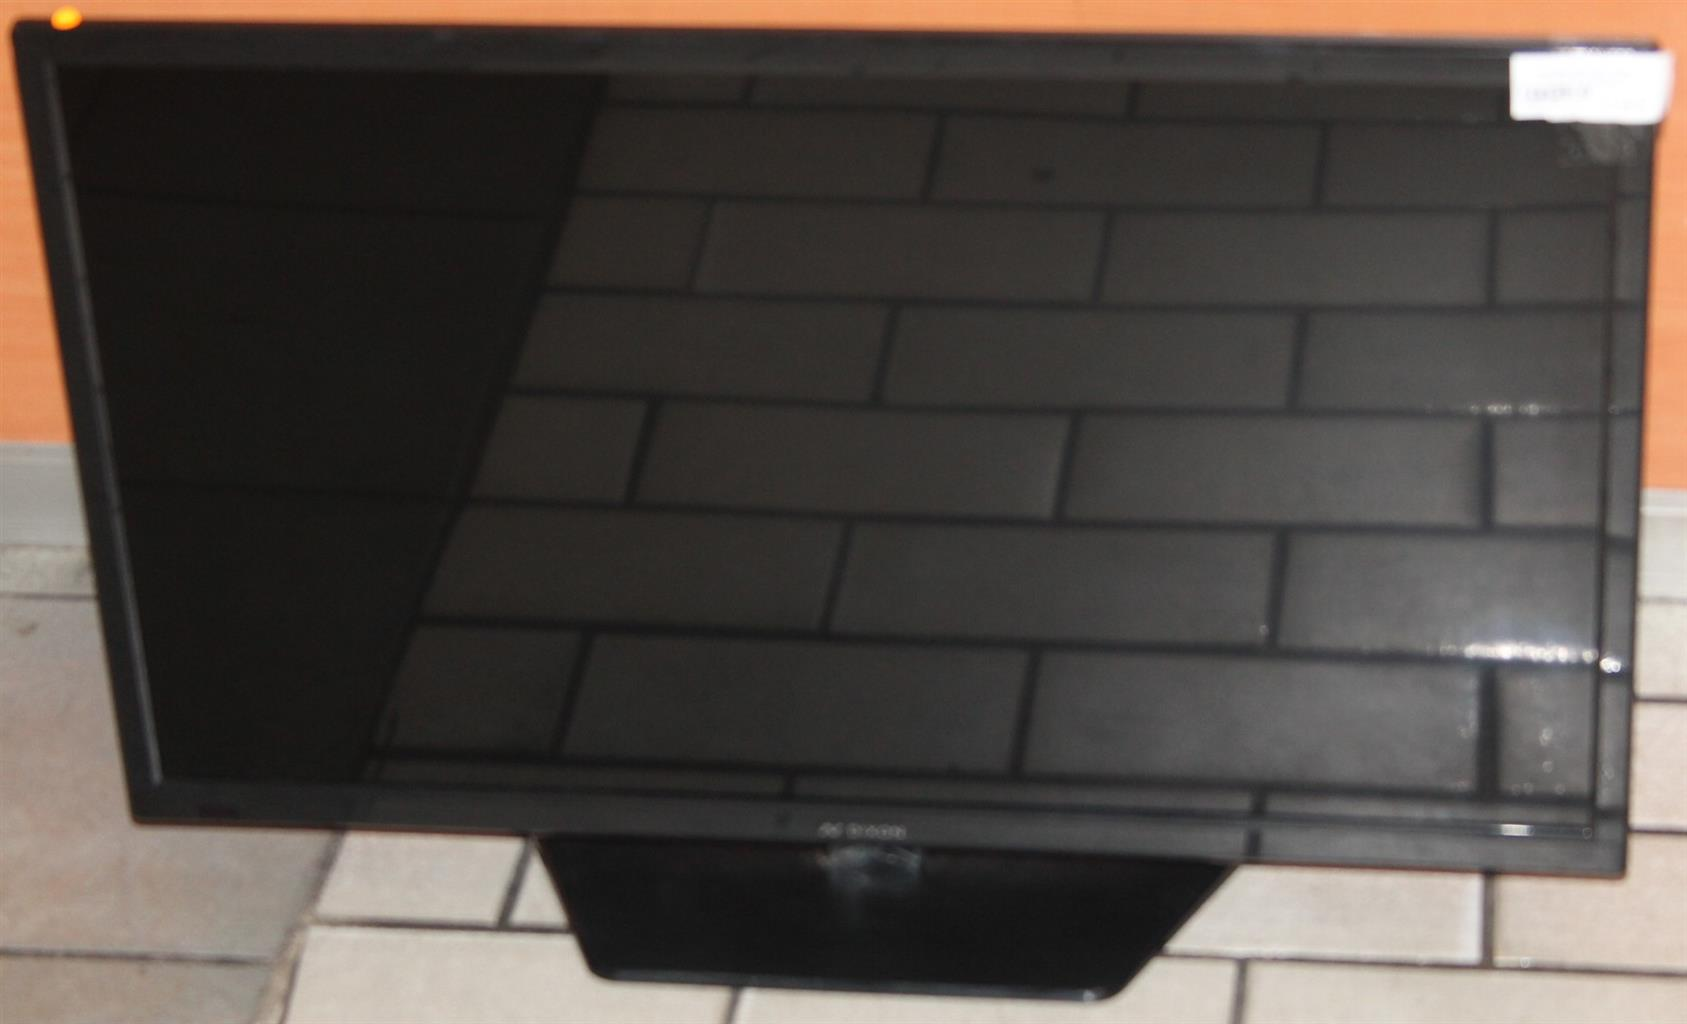 Dixon 32 inch tv S0278715a #Rosettenvillepawnshop